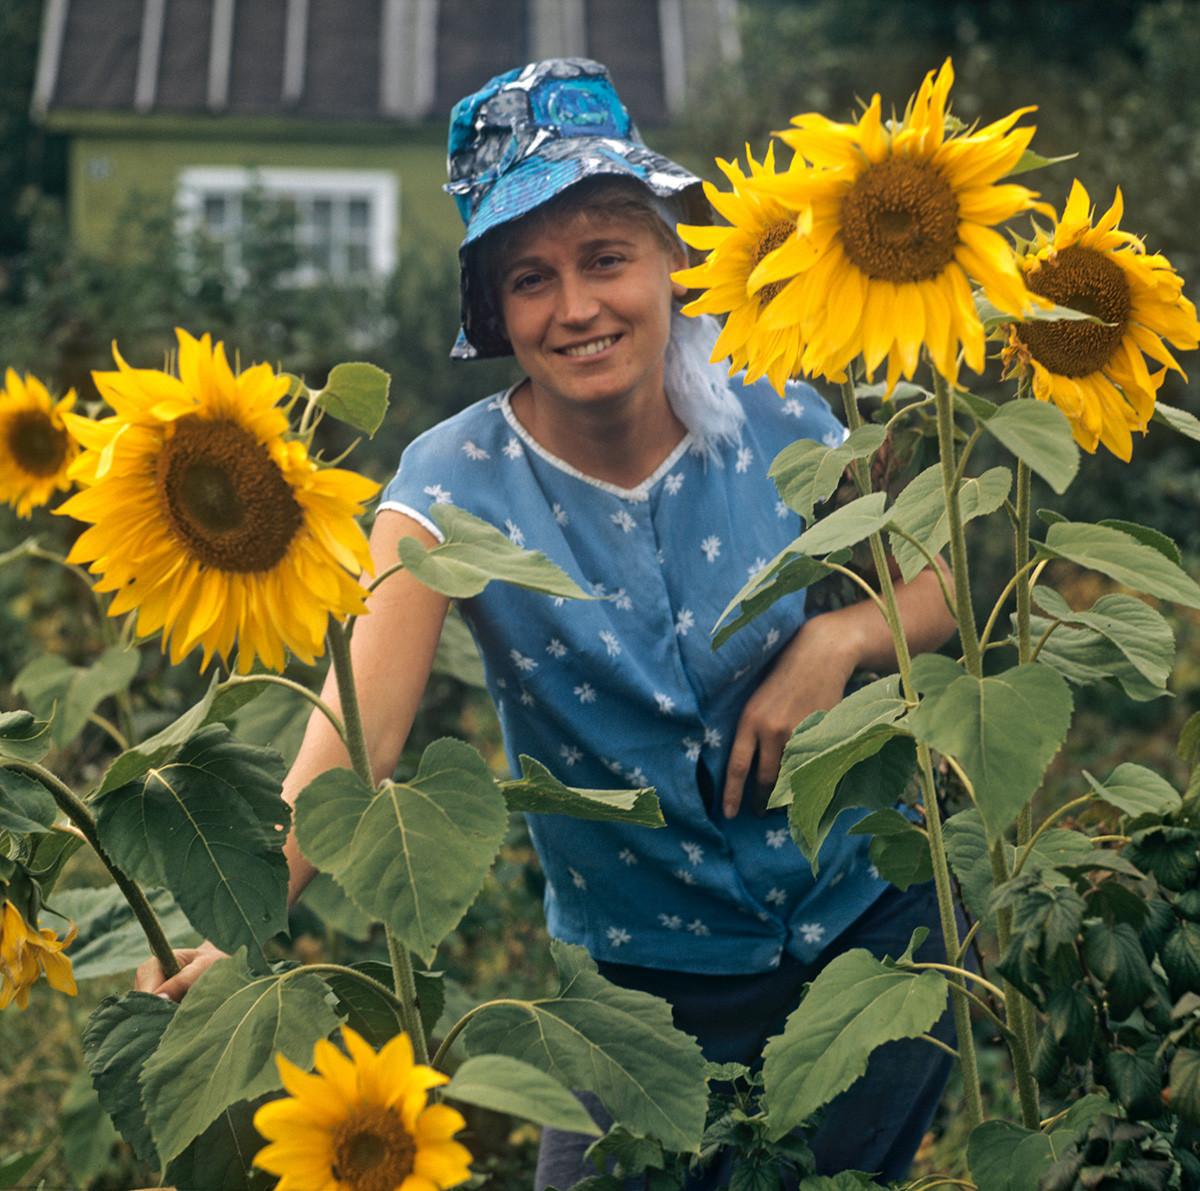 Una donna, ingegnere di una fabbrica di macchinari pesanti, tra i girasoli coltivati nella sua dacia